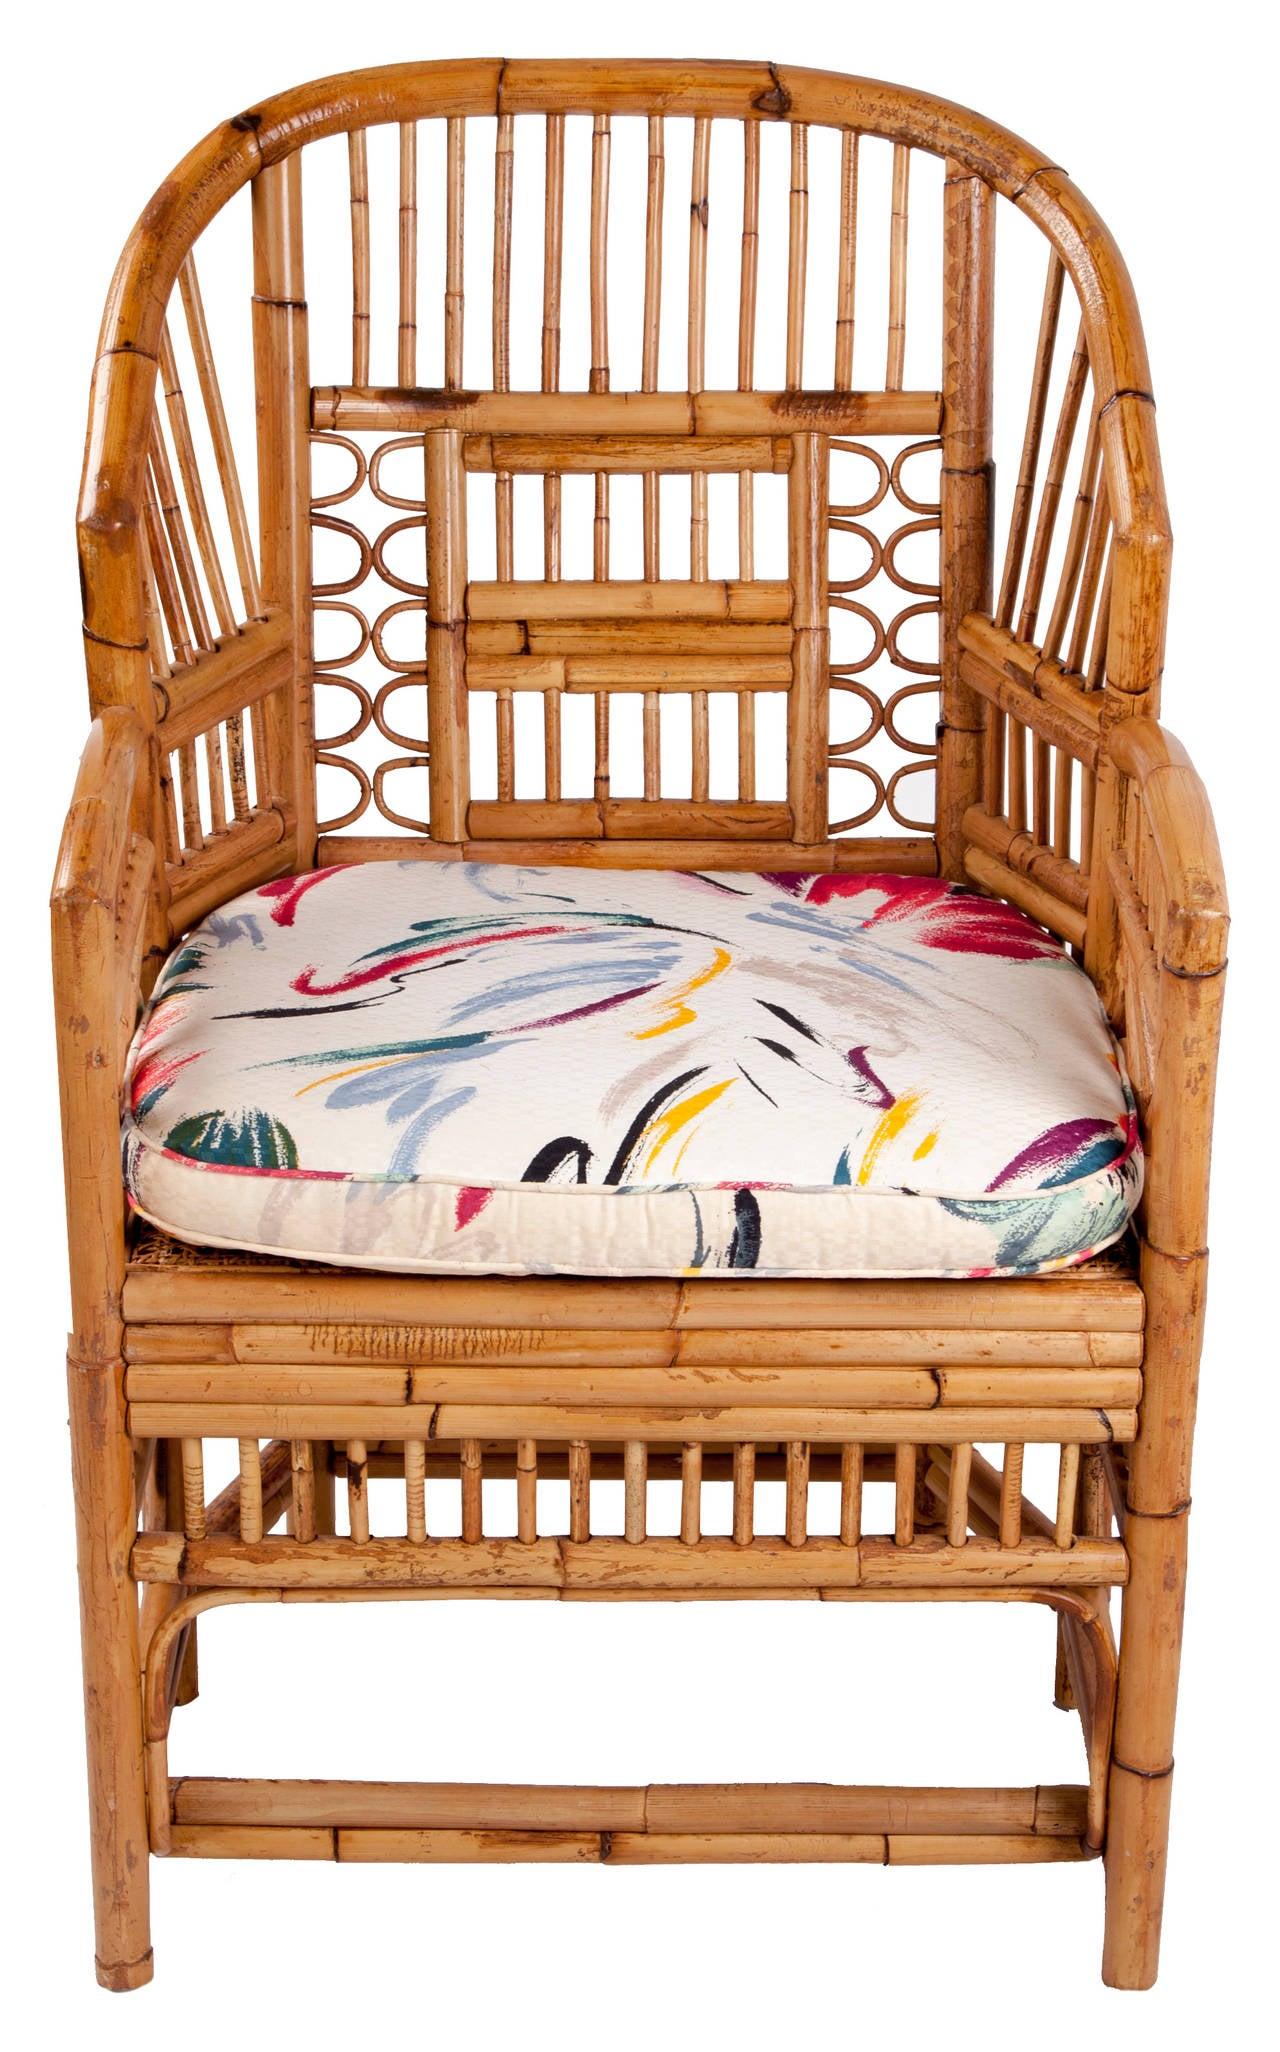 Mid Century Six Leg Rattan Armchair For Sale at 1stdibs